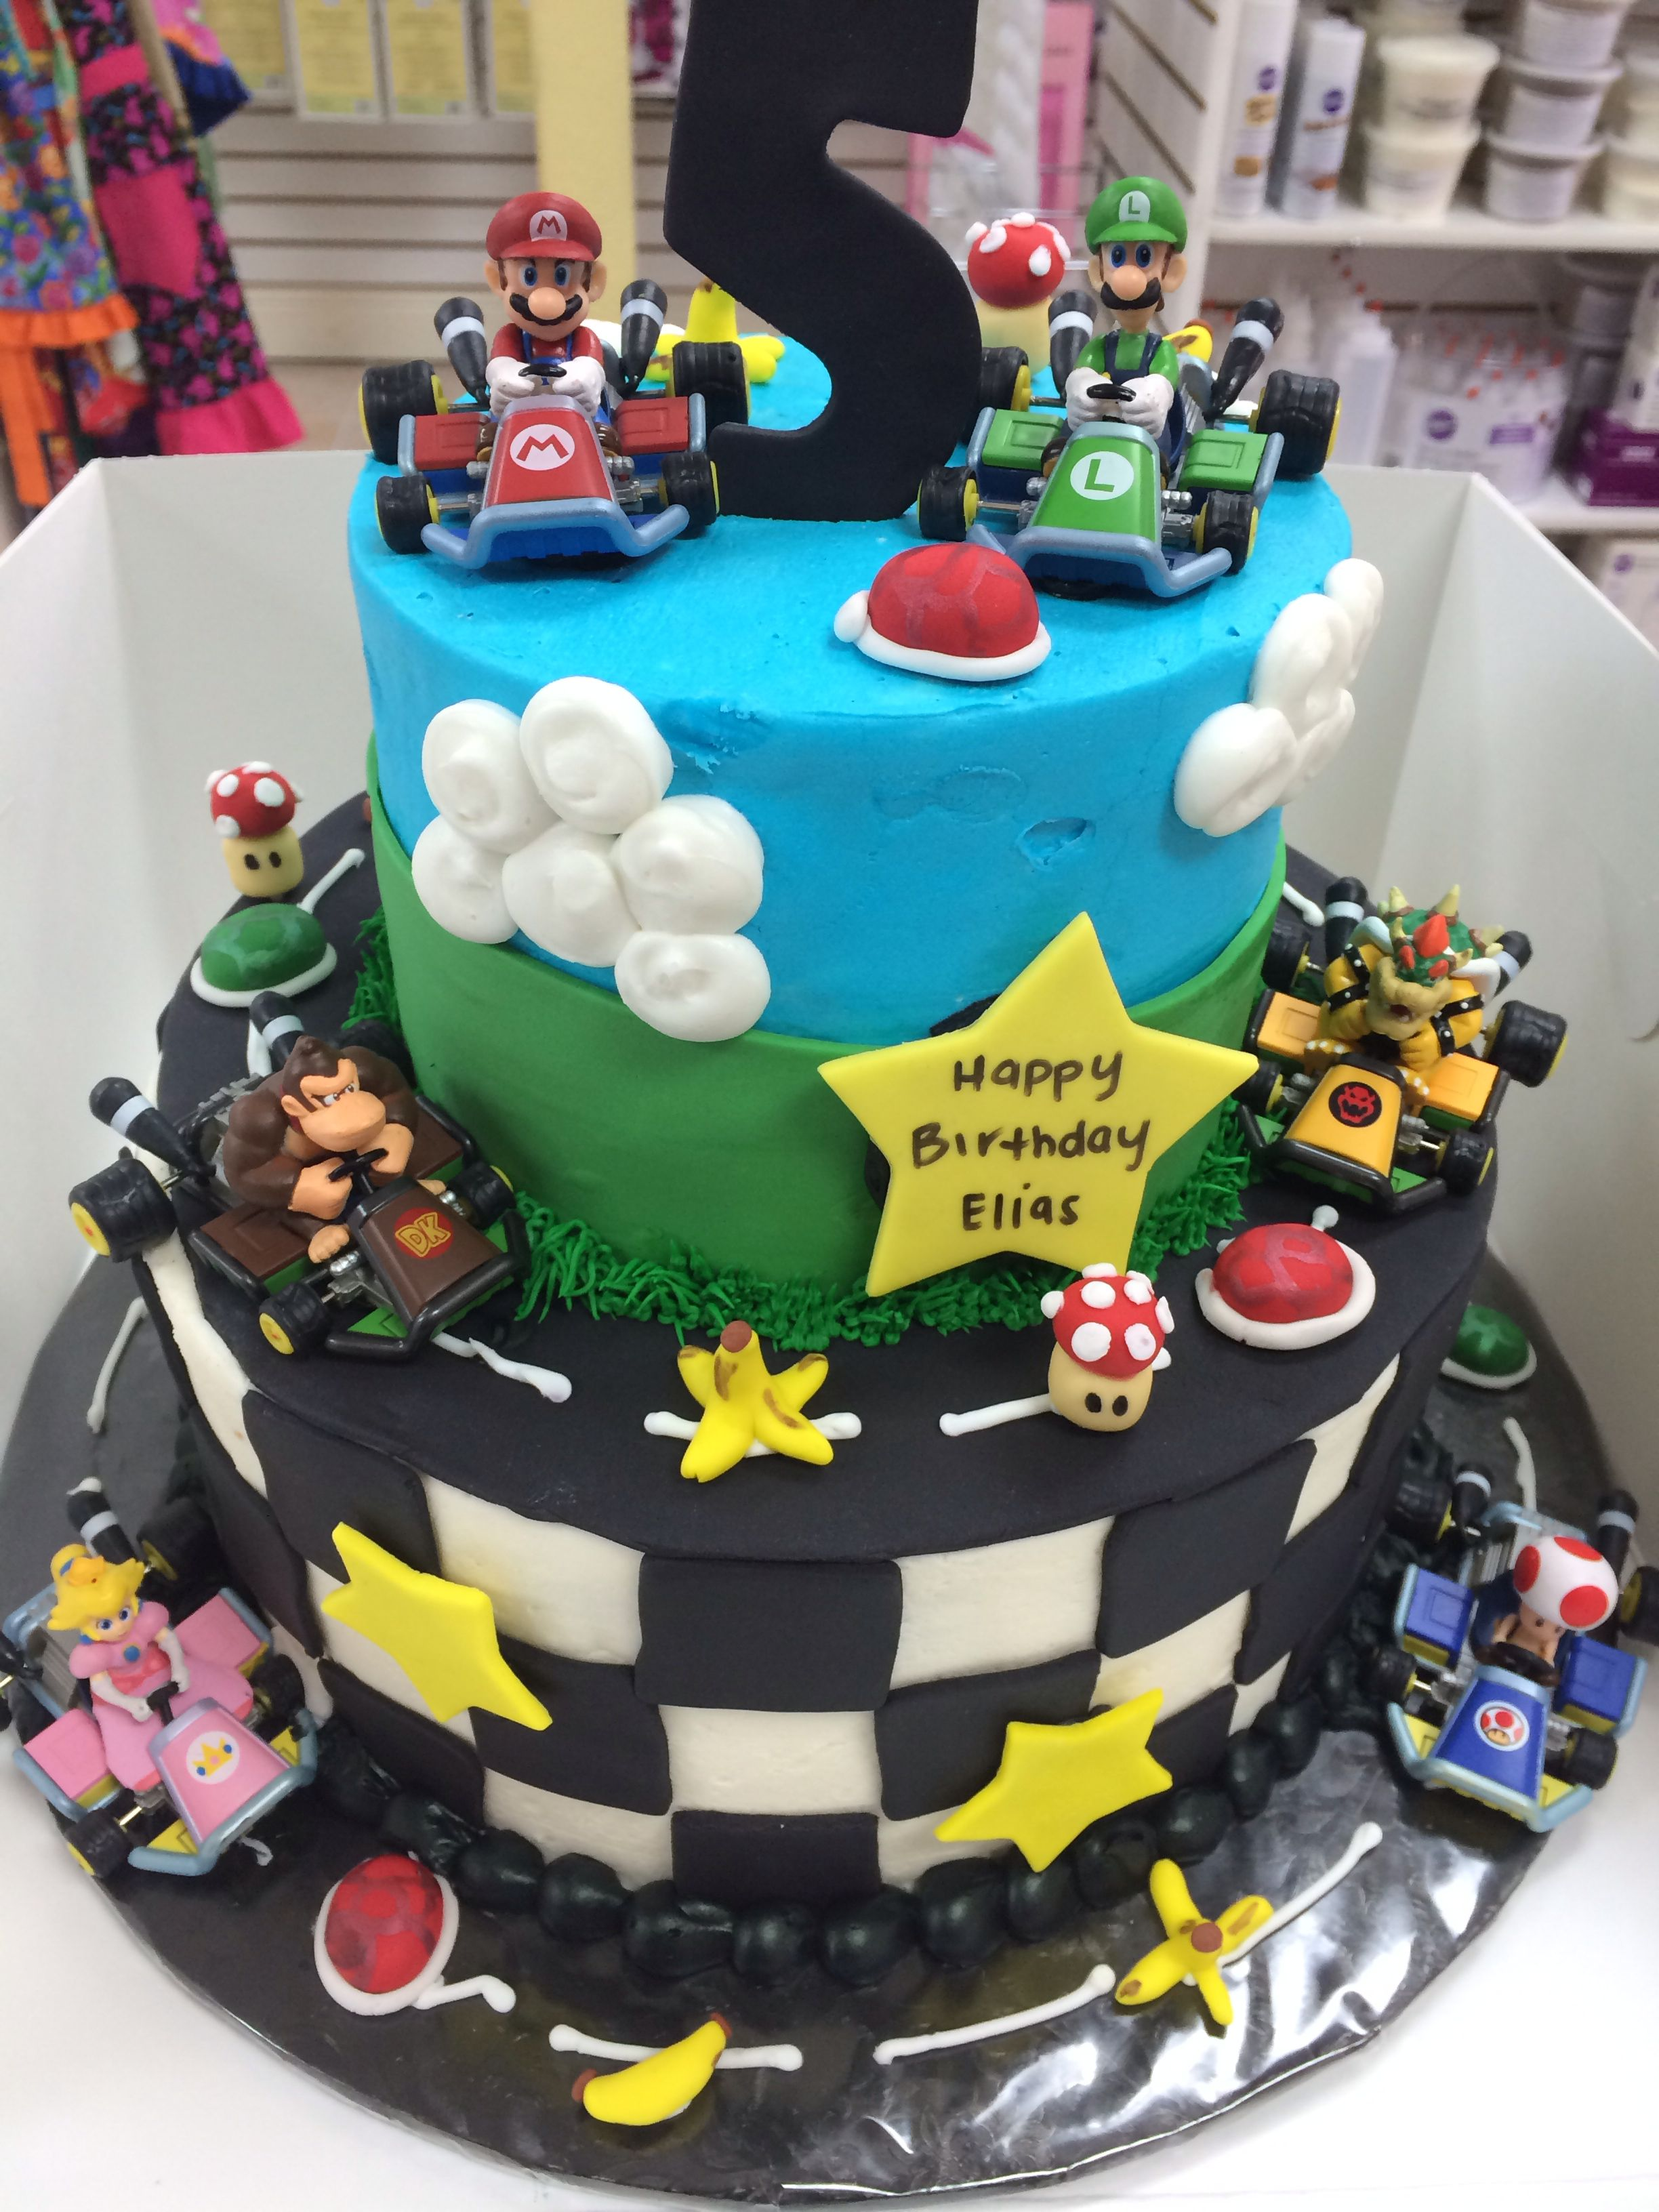 Super Mario Cake By Megan's Bake Shop In West Sacramento